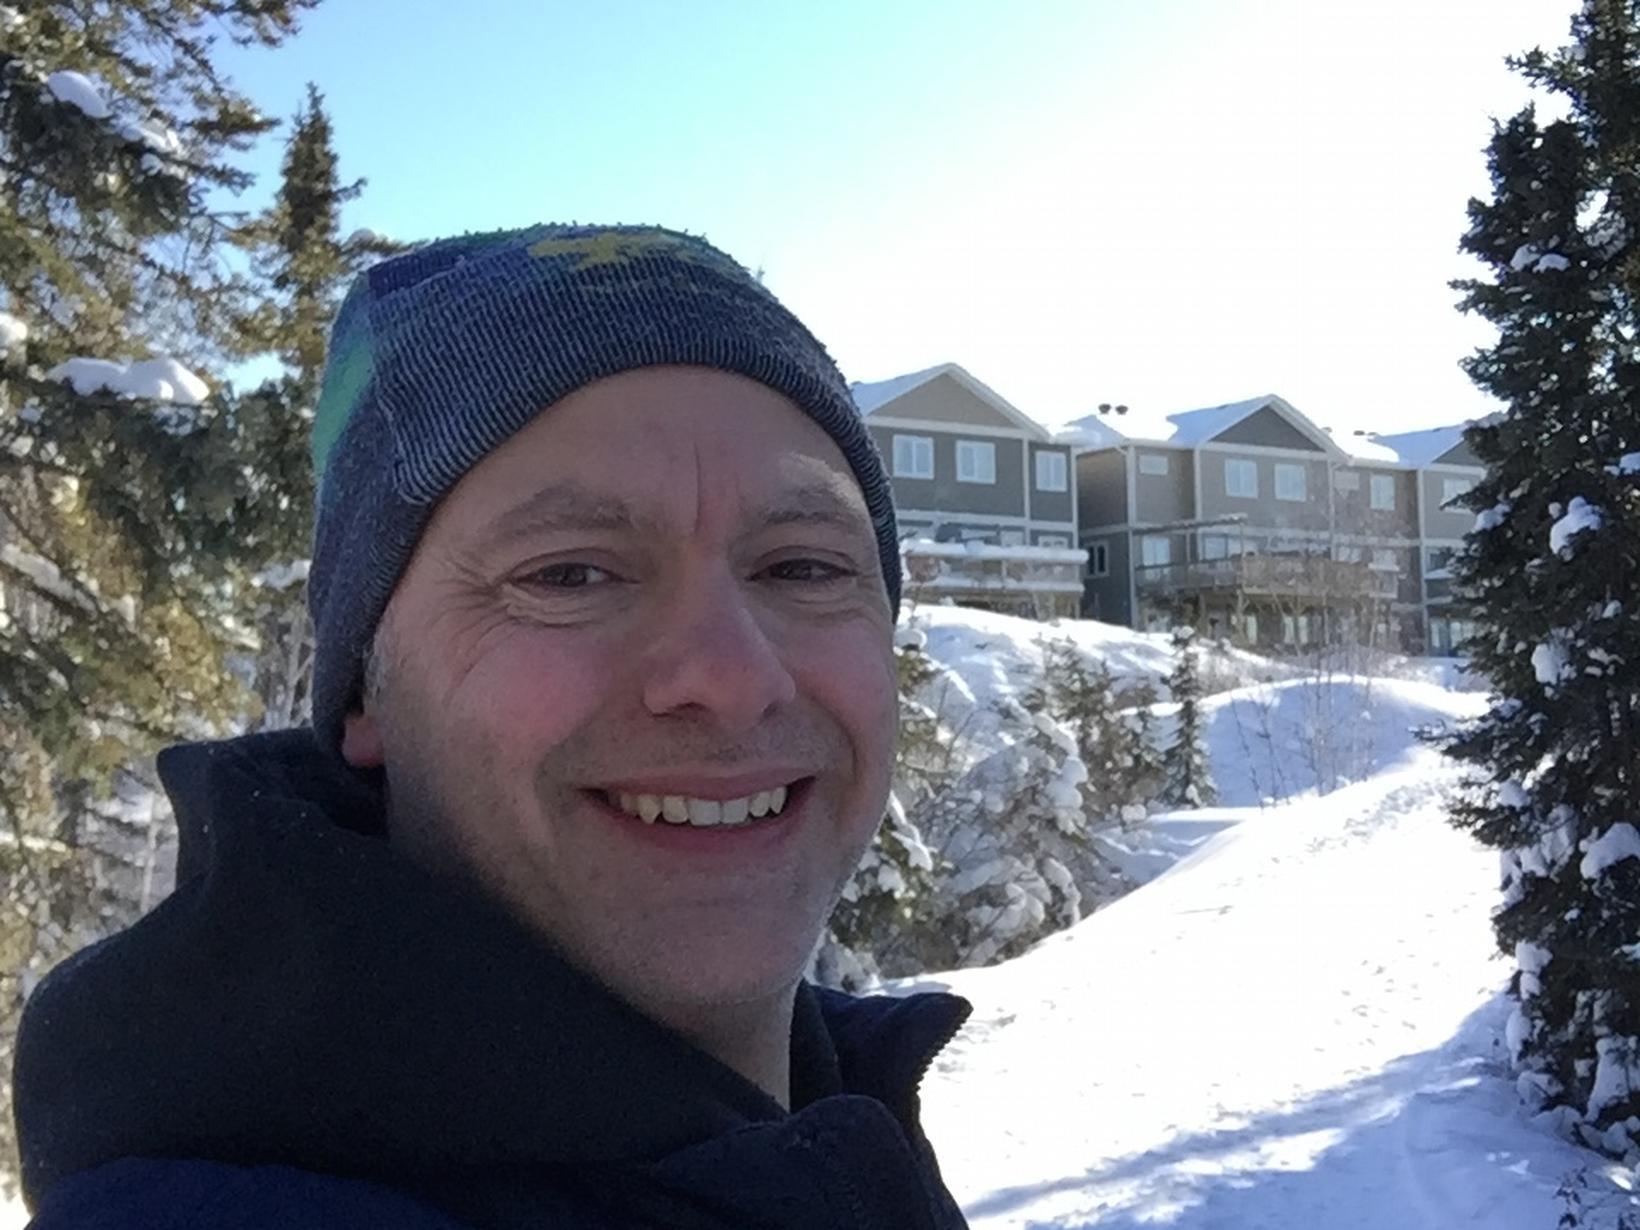 Paul from Yellowknife, Northwest Territories, Canada